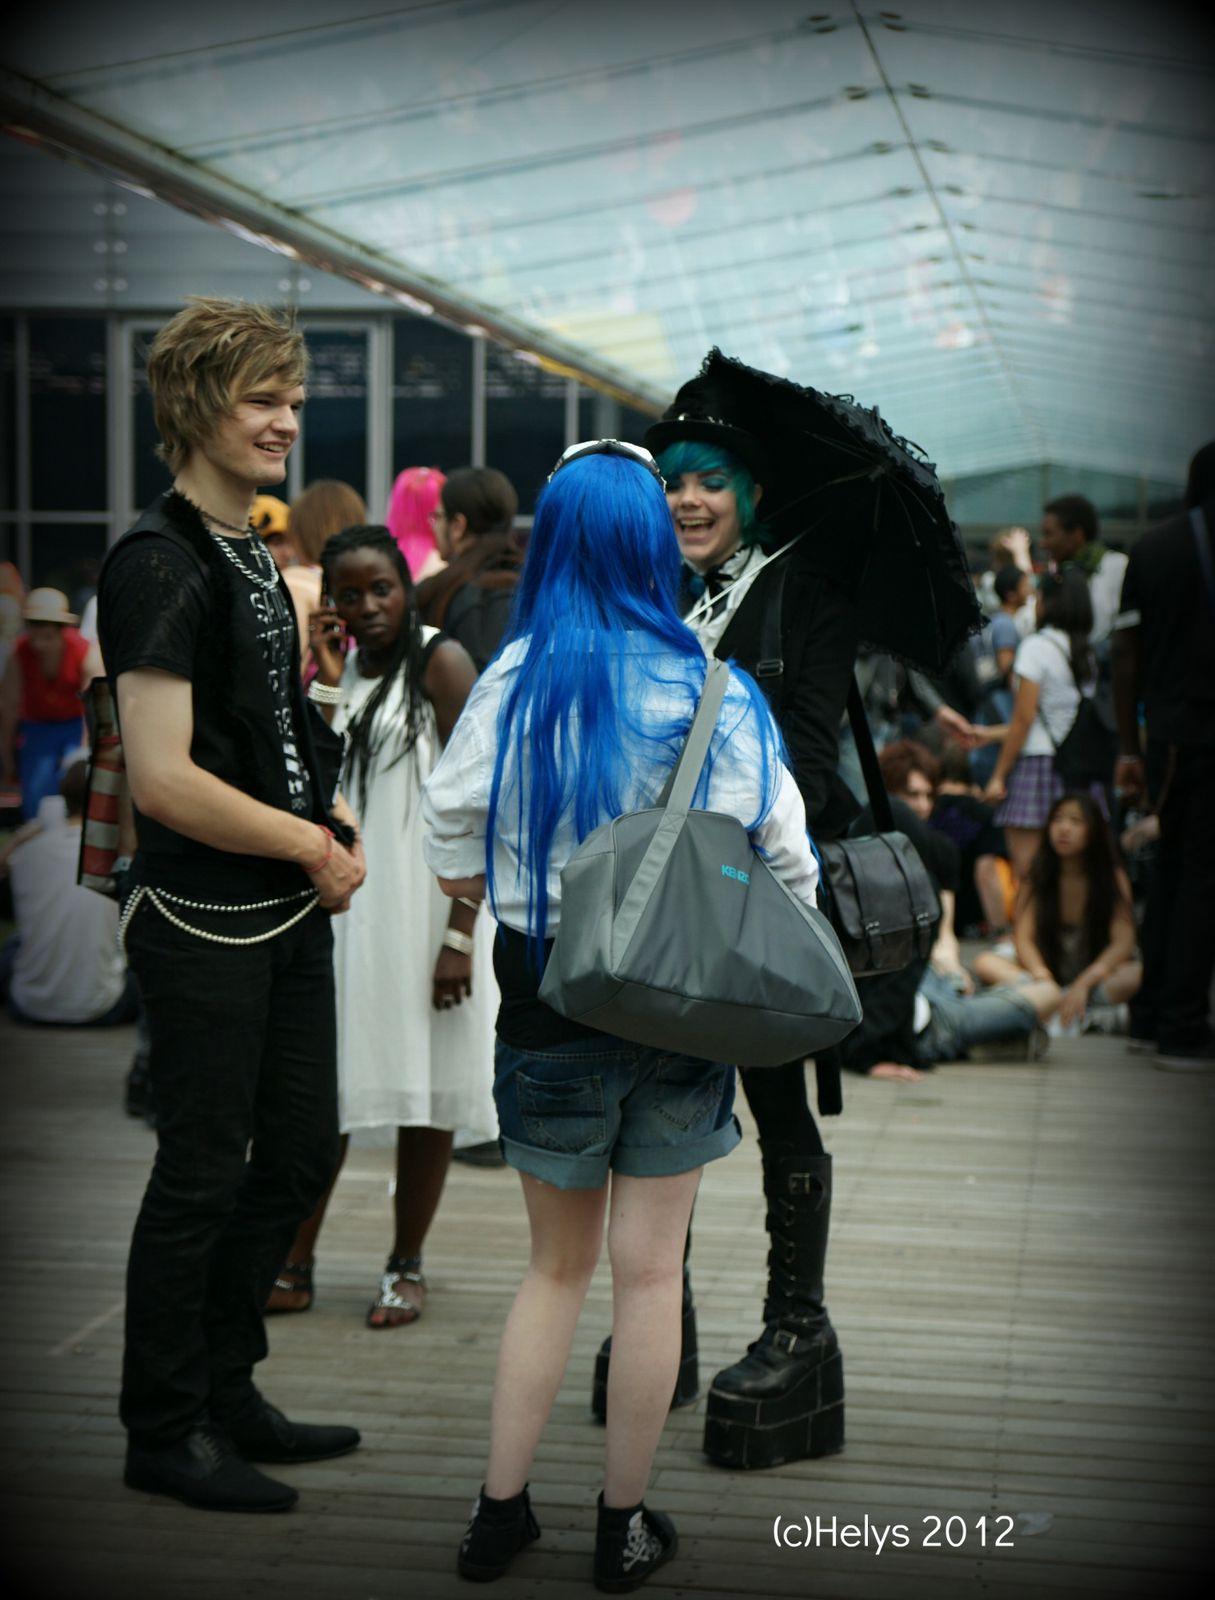 Japan expo 2012: Cosplay 6